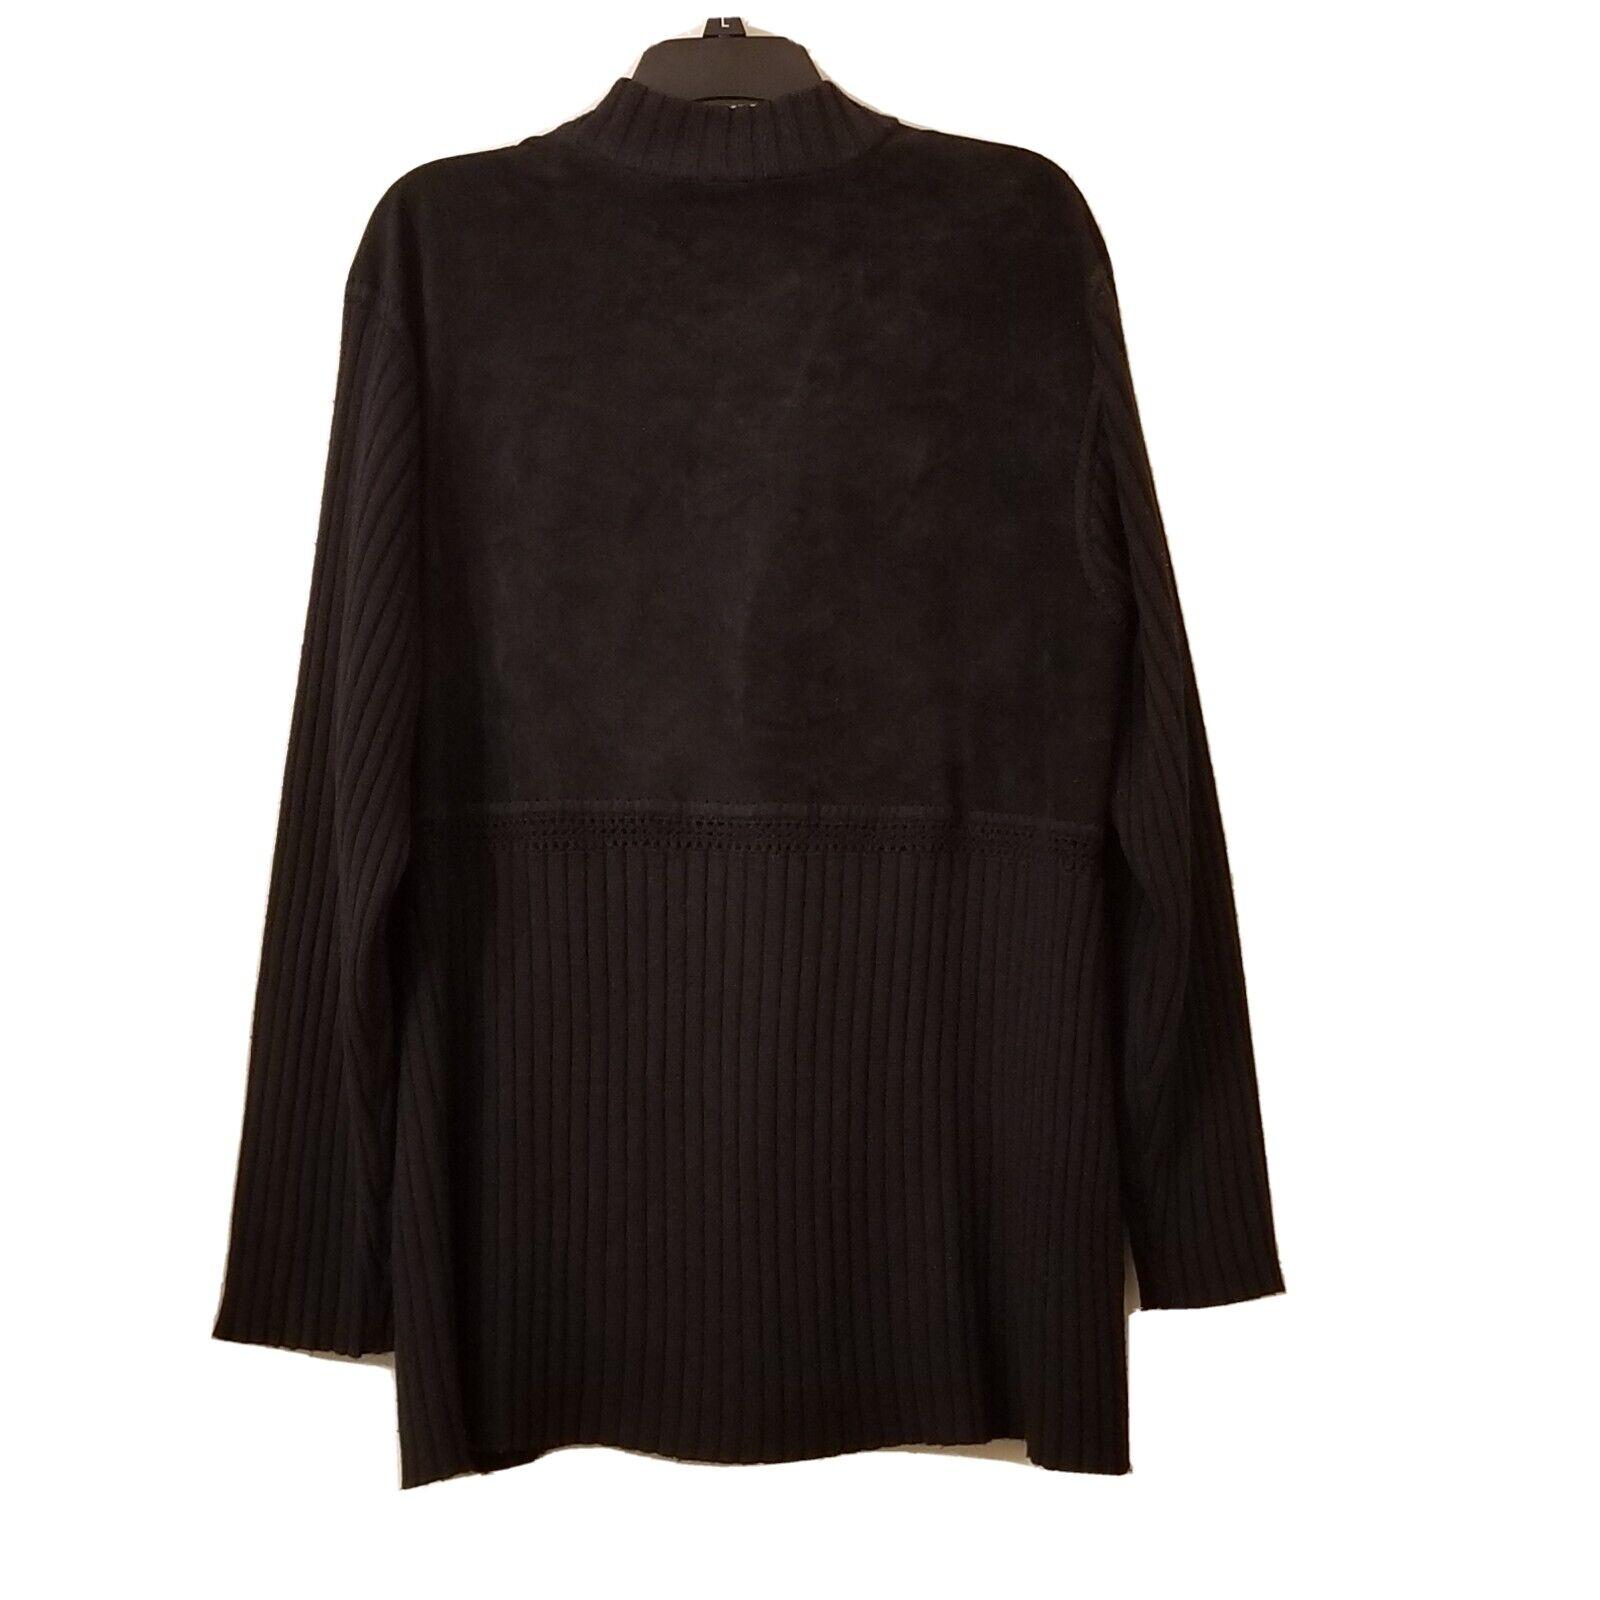 J Jill Cardigan  Wool/suede Leather Blend Woven L… - image 6